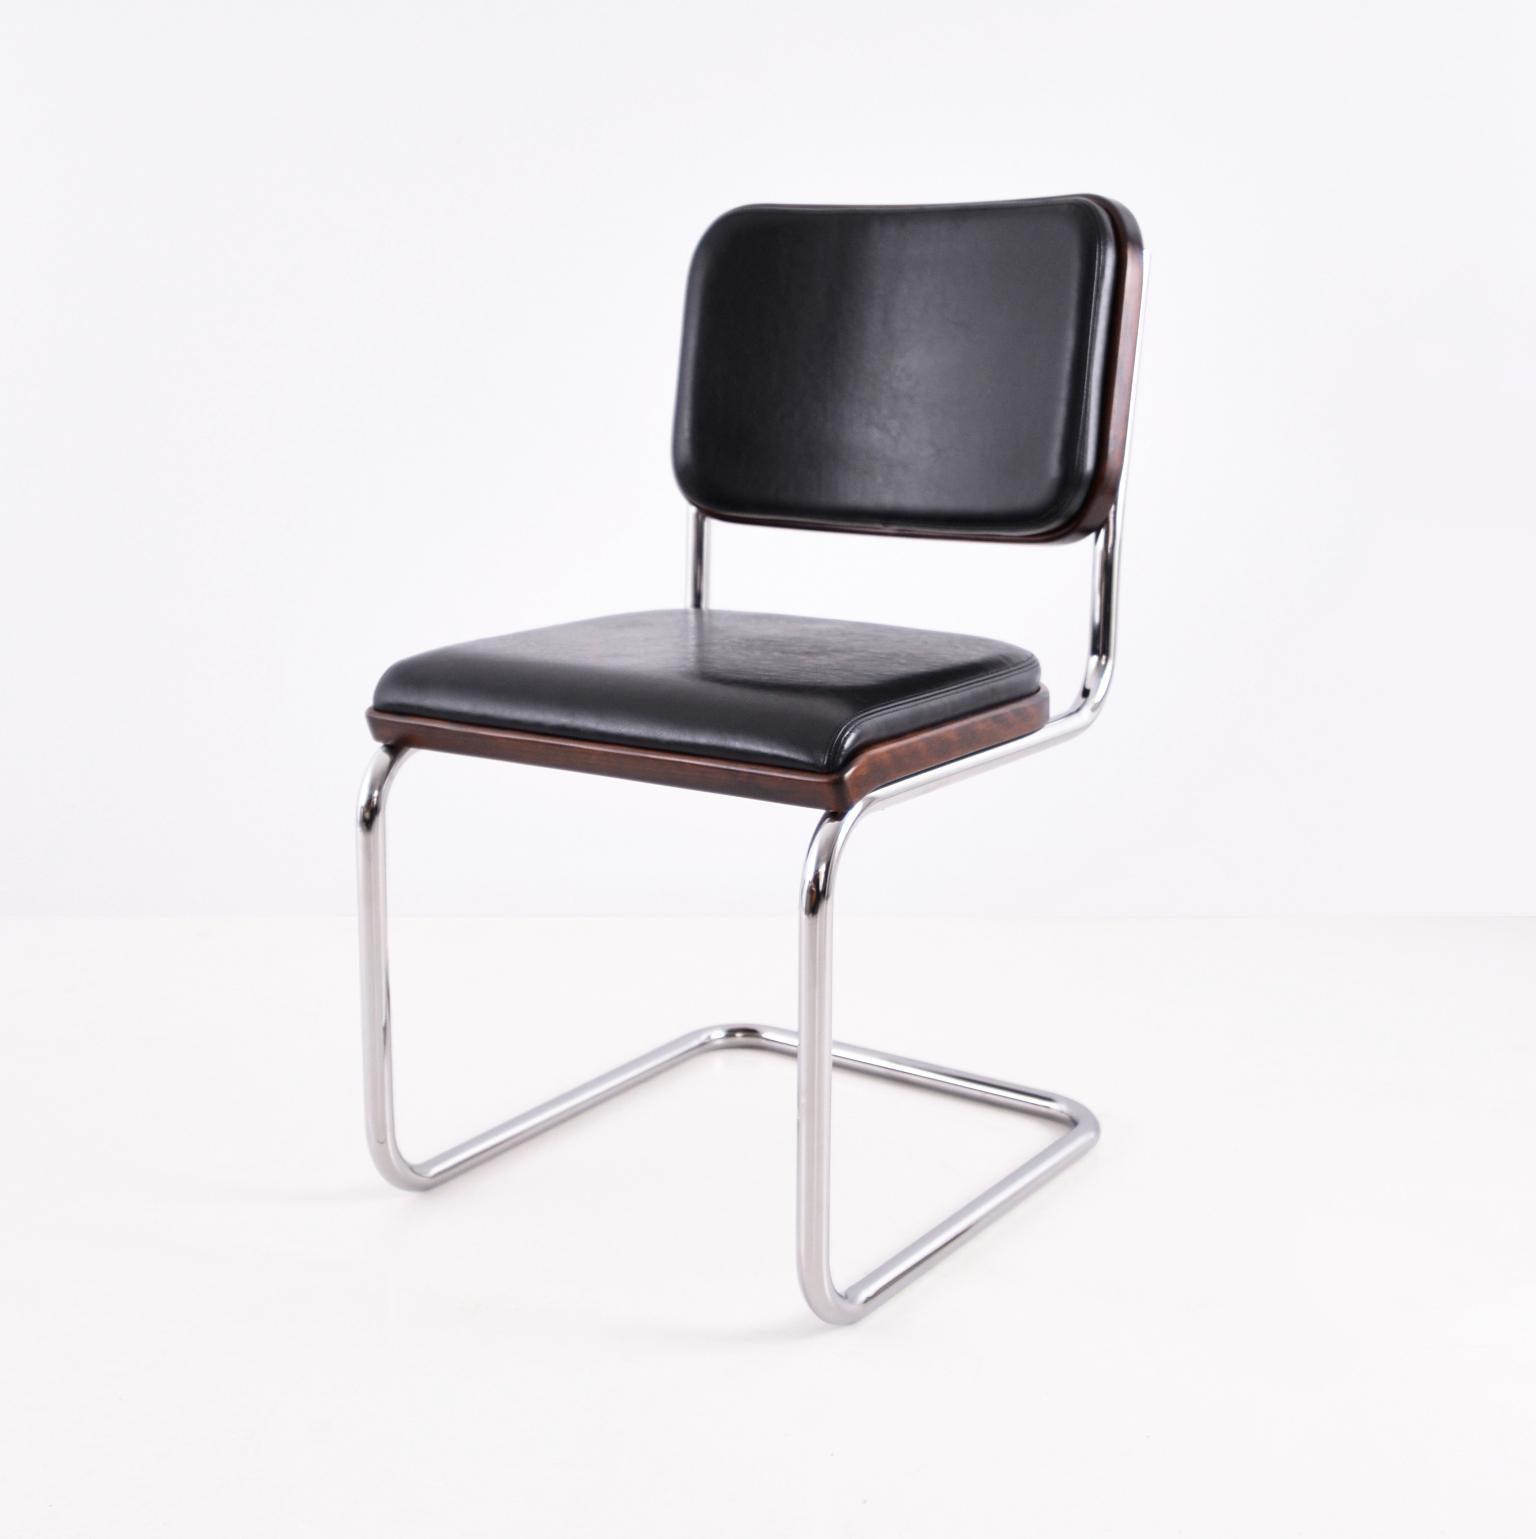 Bauhaus Upholstered Tubular Steel Cantilever Cesca Chair By Marcel Breuer